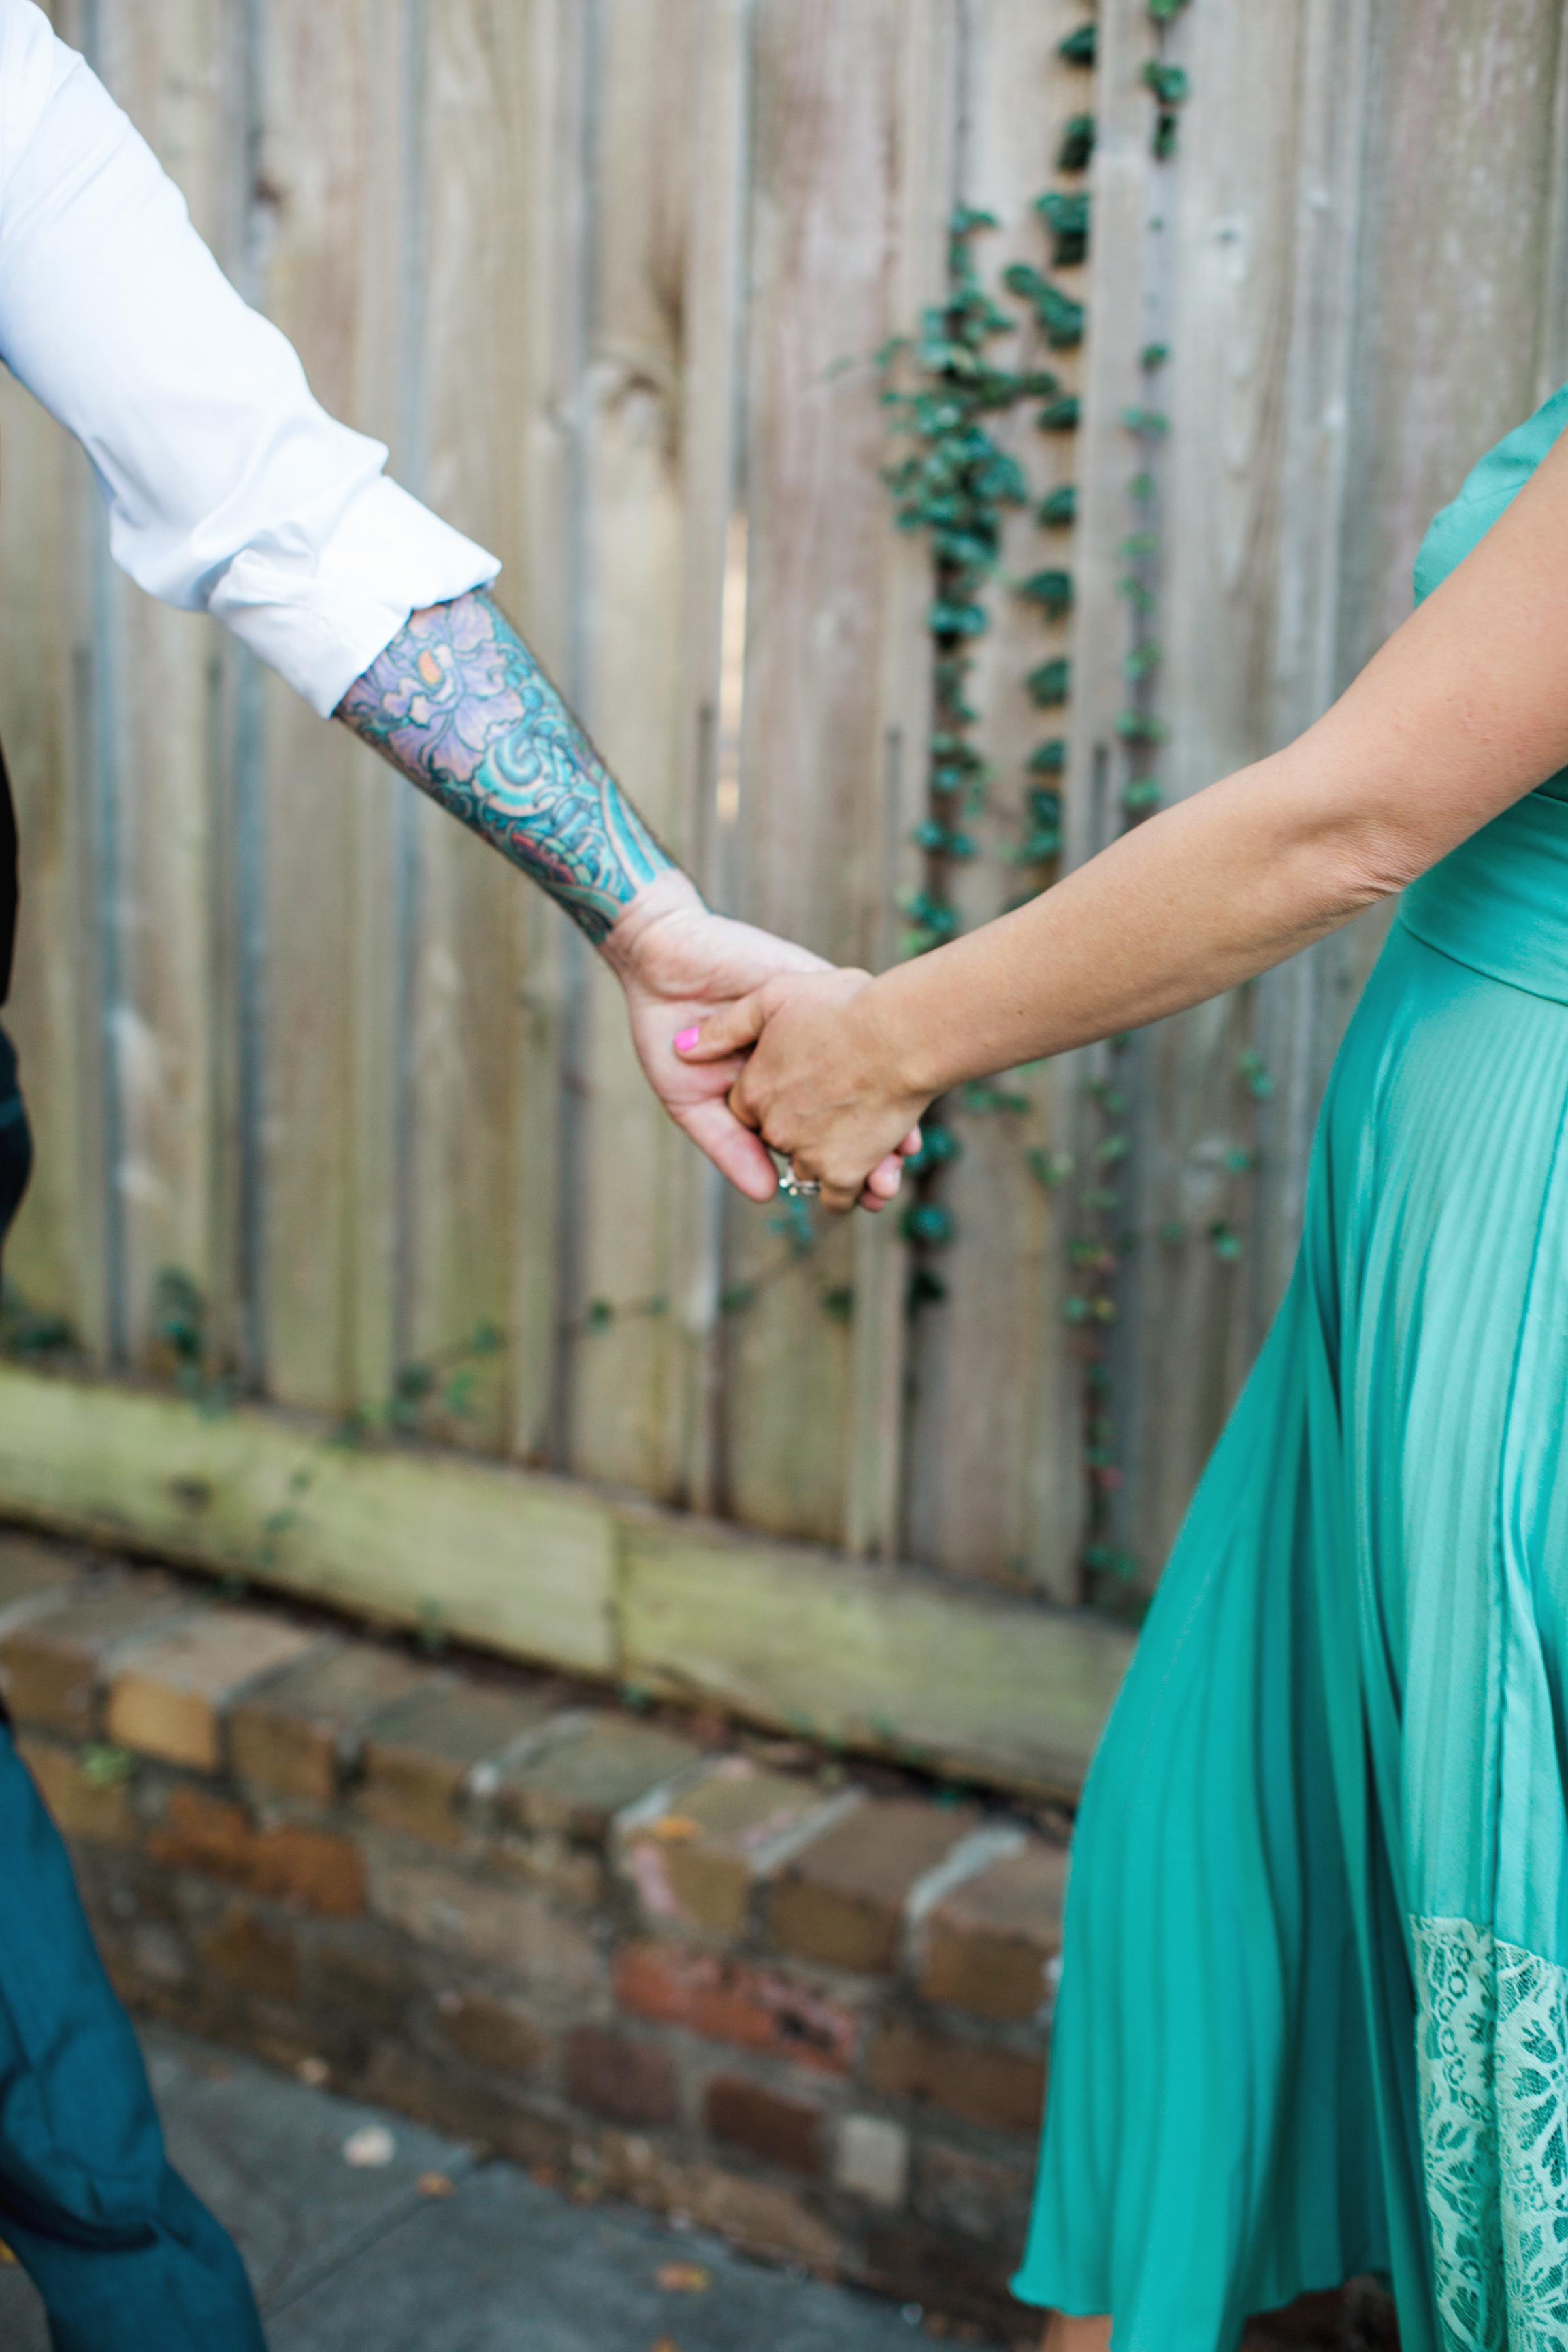 CindyGiovagnoliPhotography_Seattle_Washington_PNW_Couple_Engagement_Portrait_Photography-017.jpg